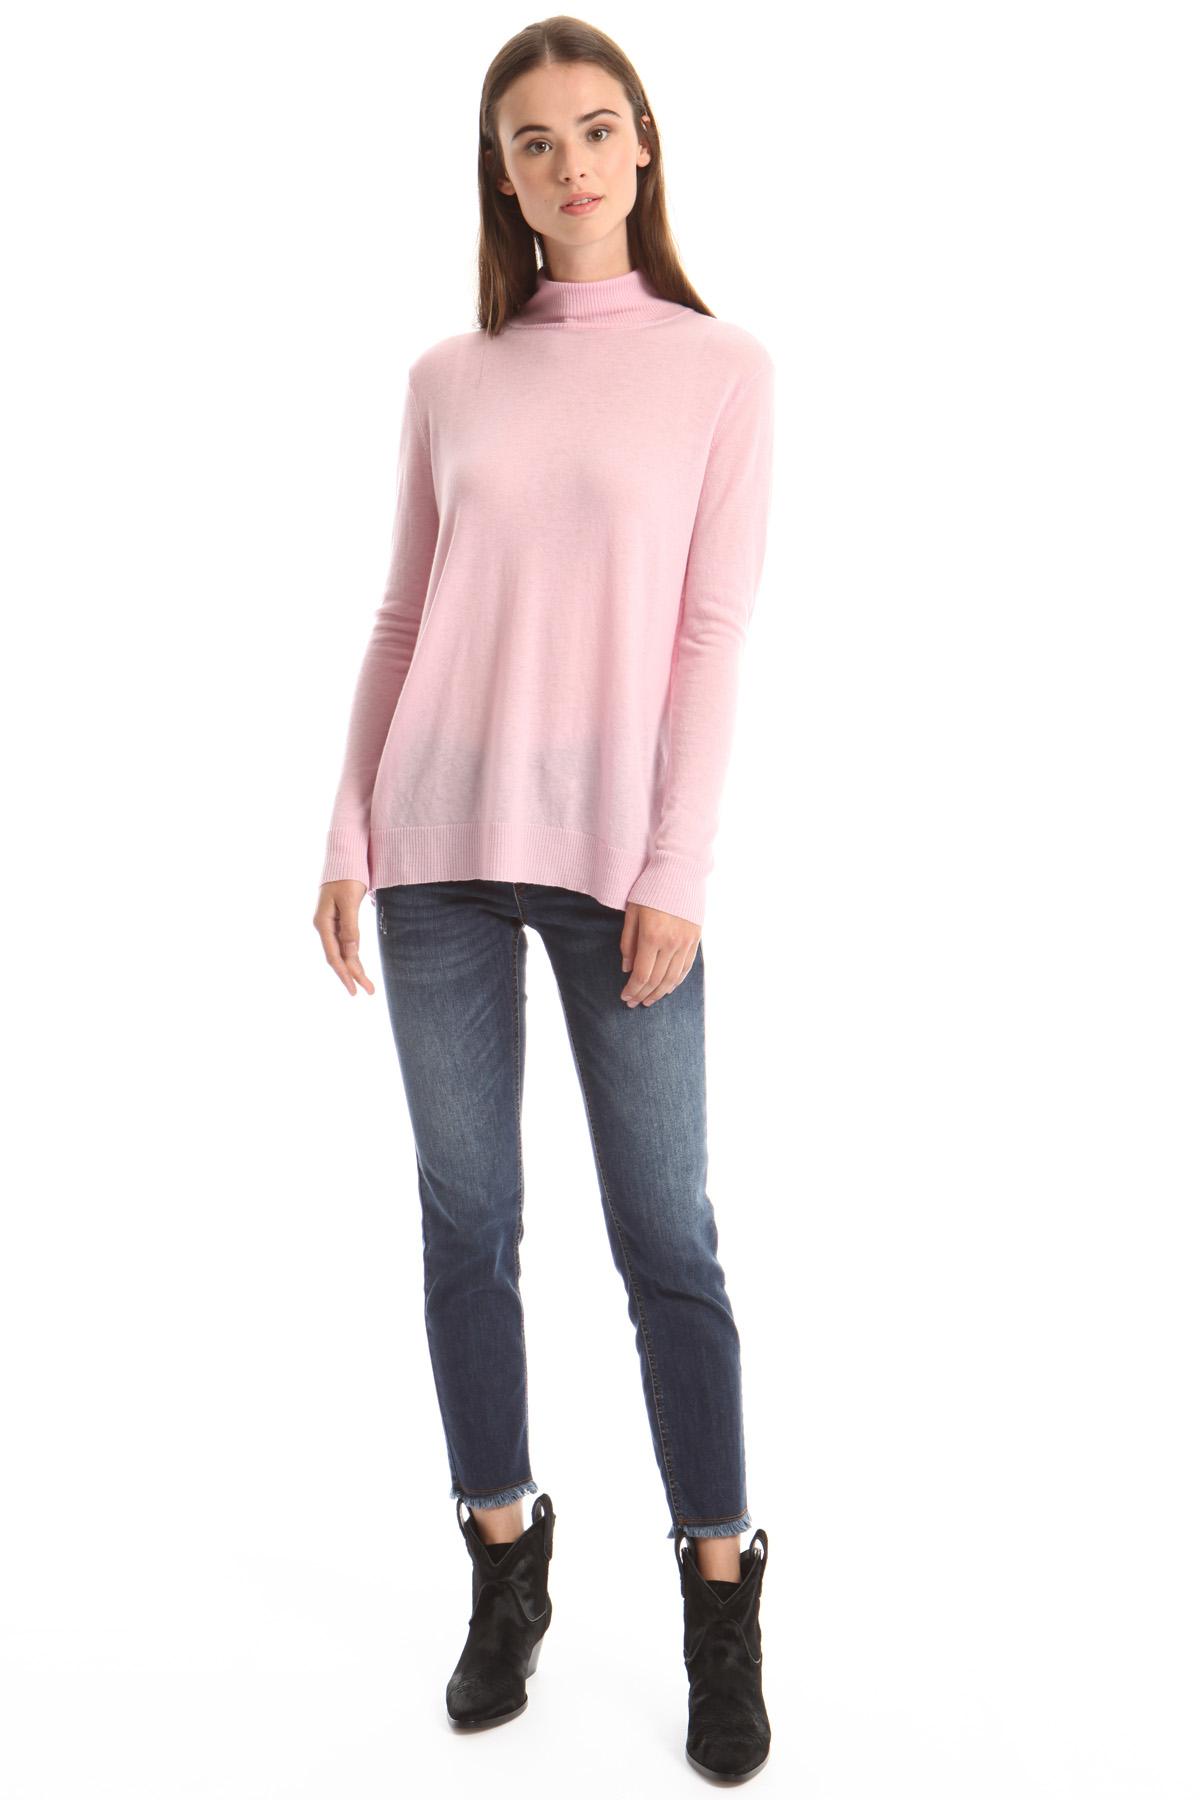 Deborah maglia 100% cashmere rosa